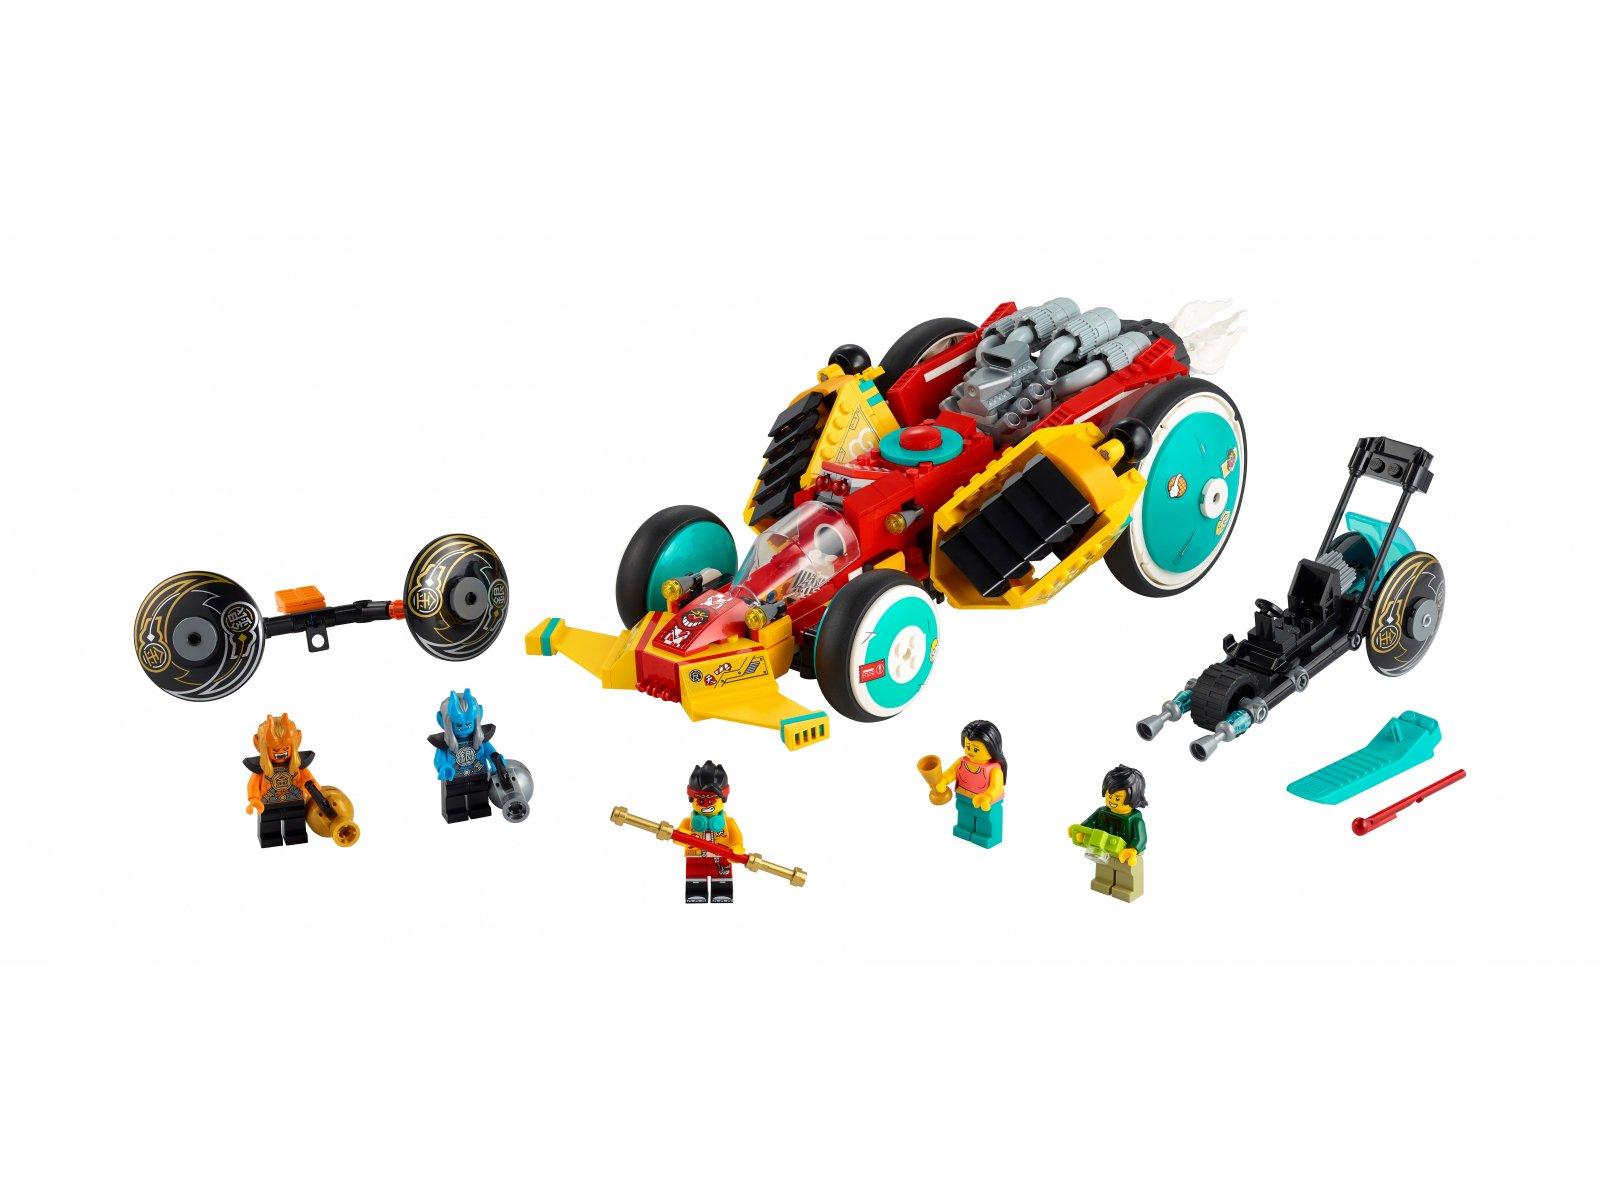 LEGO Monkie Kid™ 80015 Chmurkowy roadster Monkie Kida